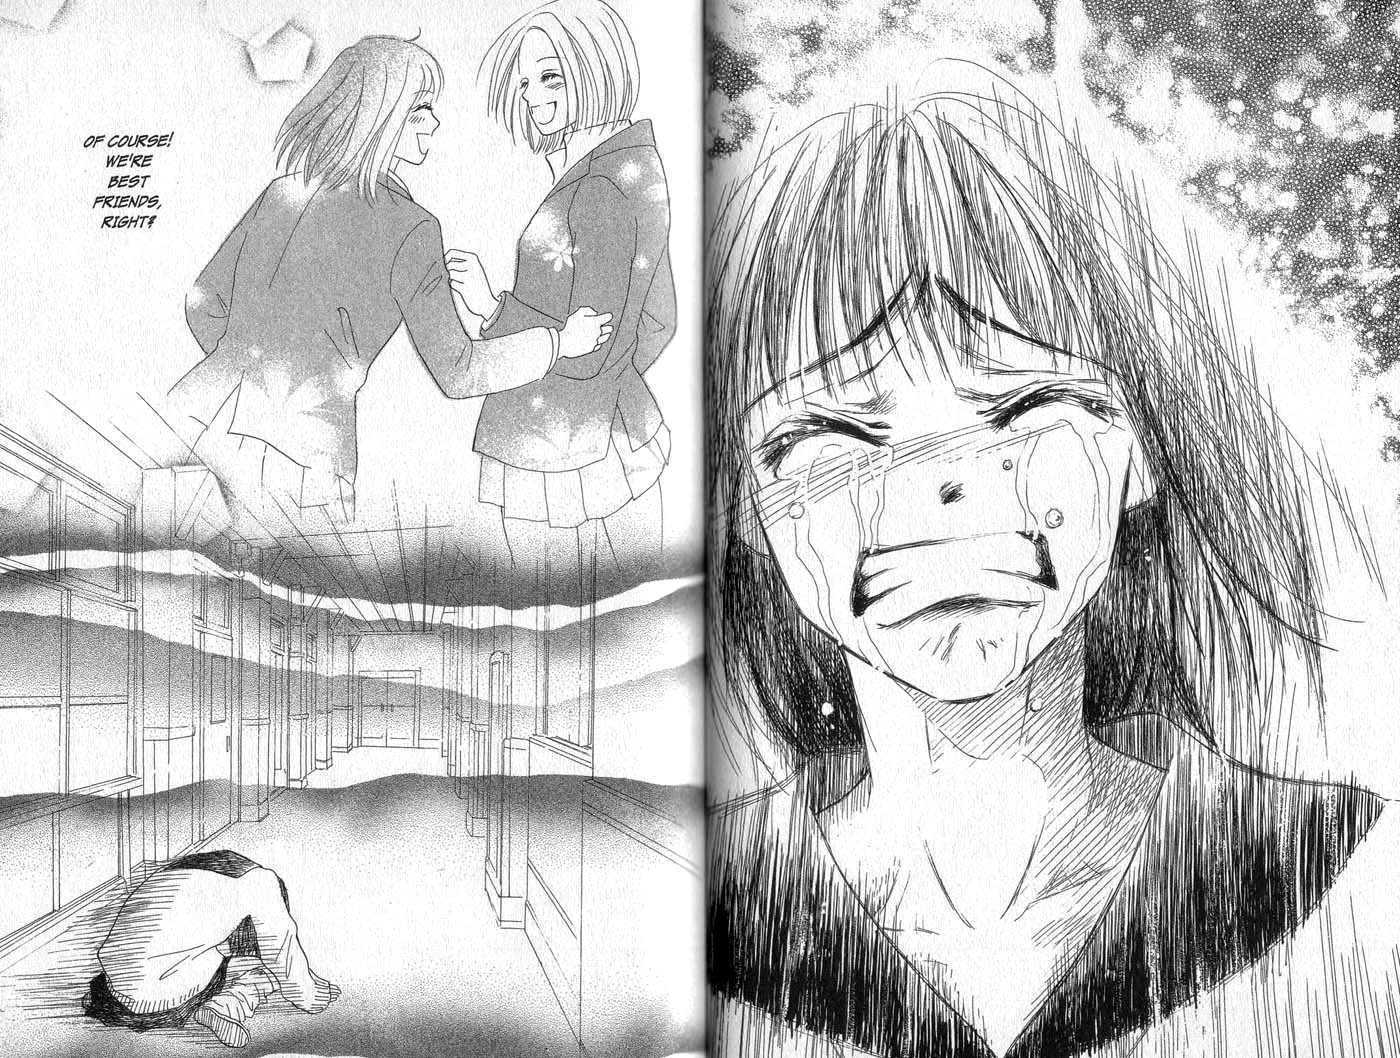 Life Manga  E  A E  A E   Images The Loss Of A Friend Hd Wallpaper And Background Photos